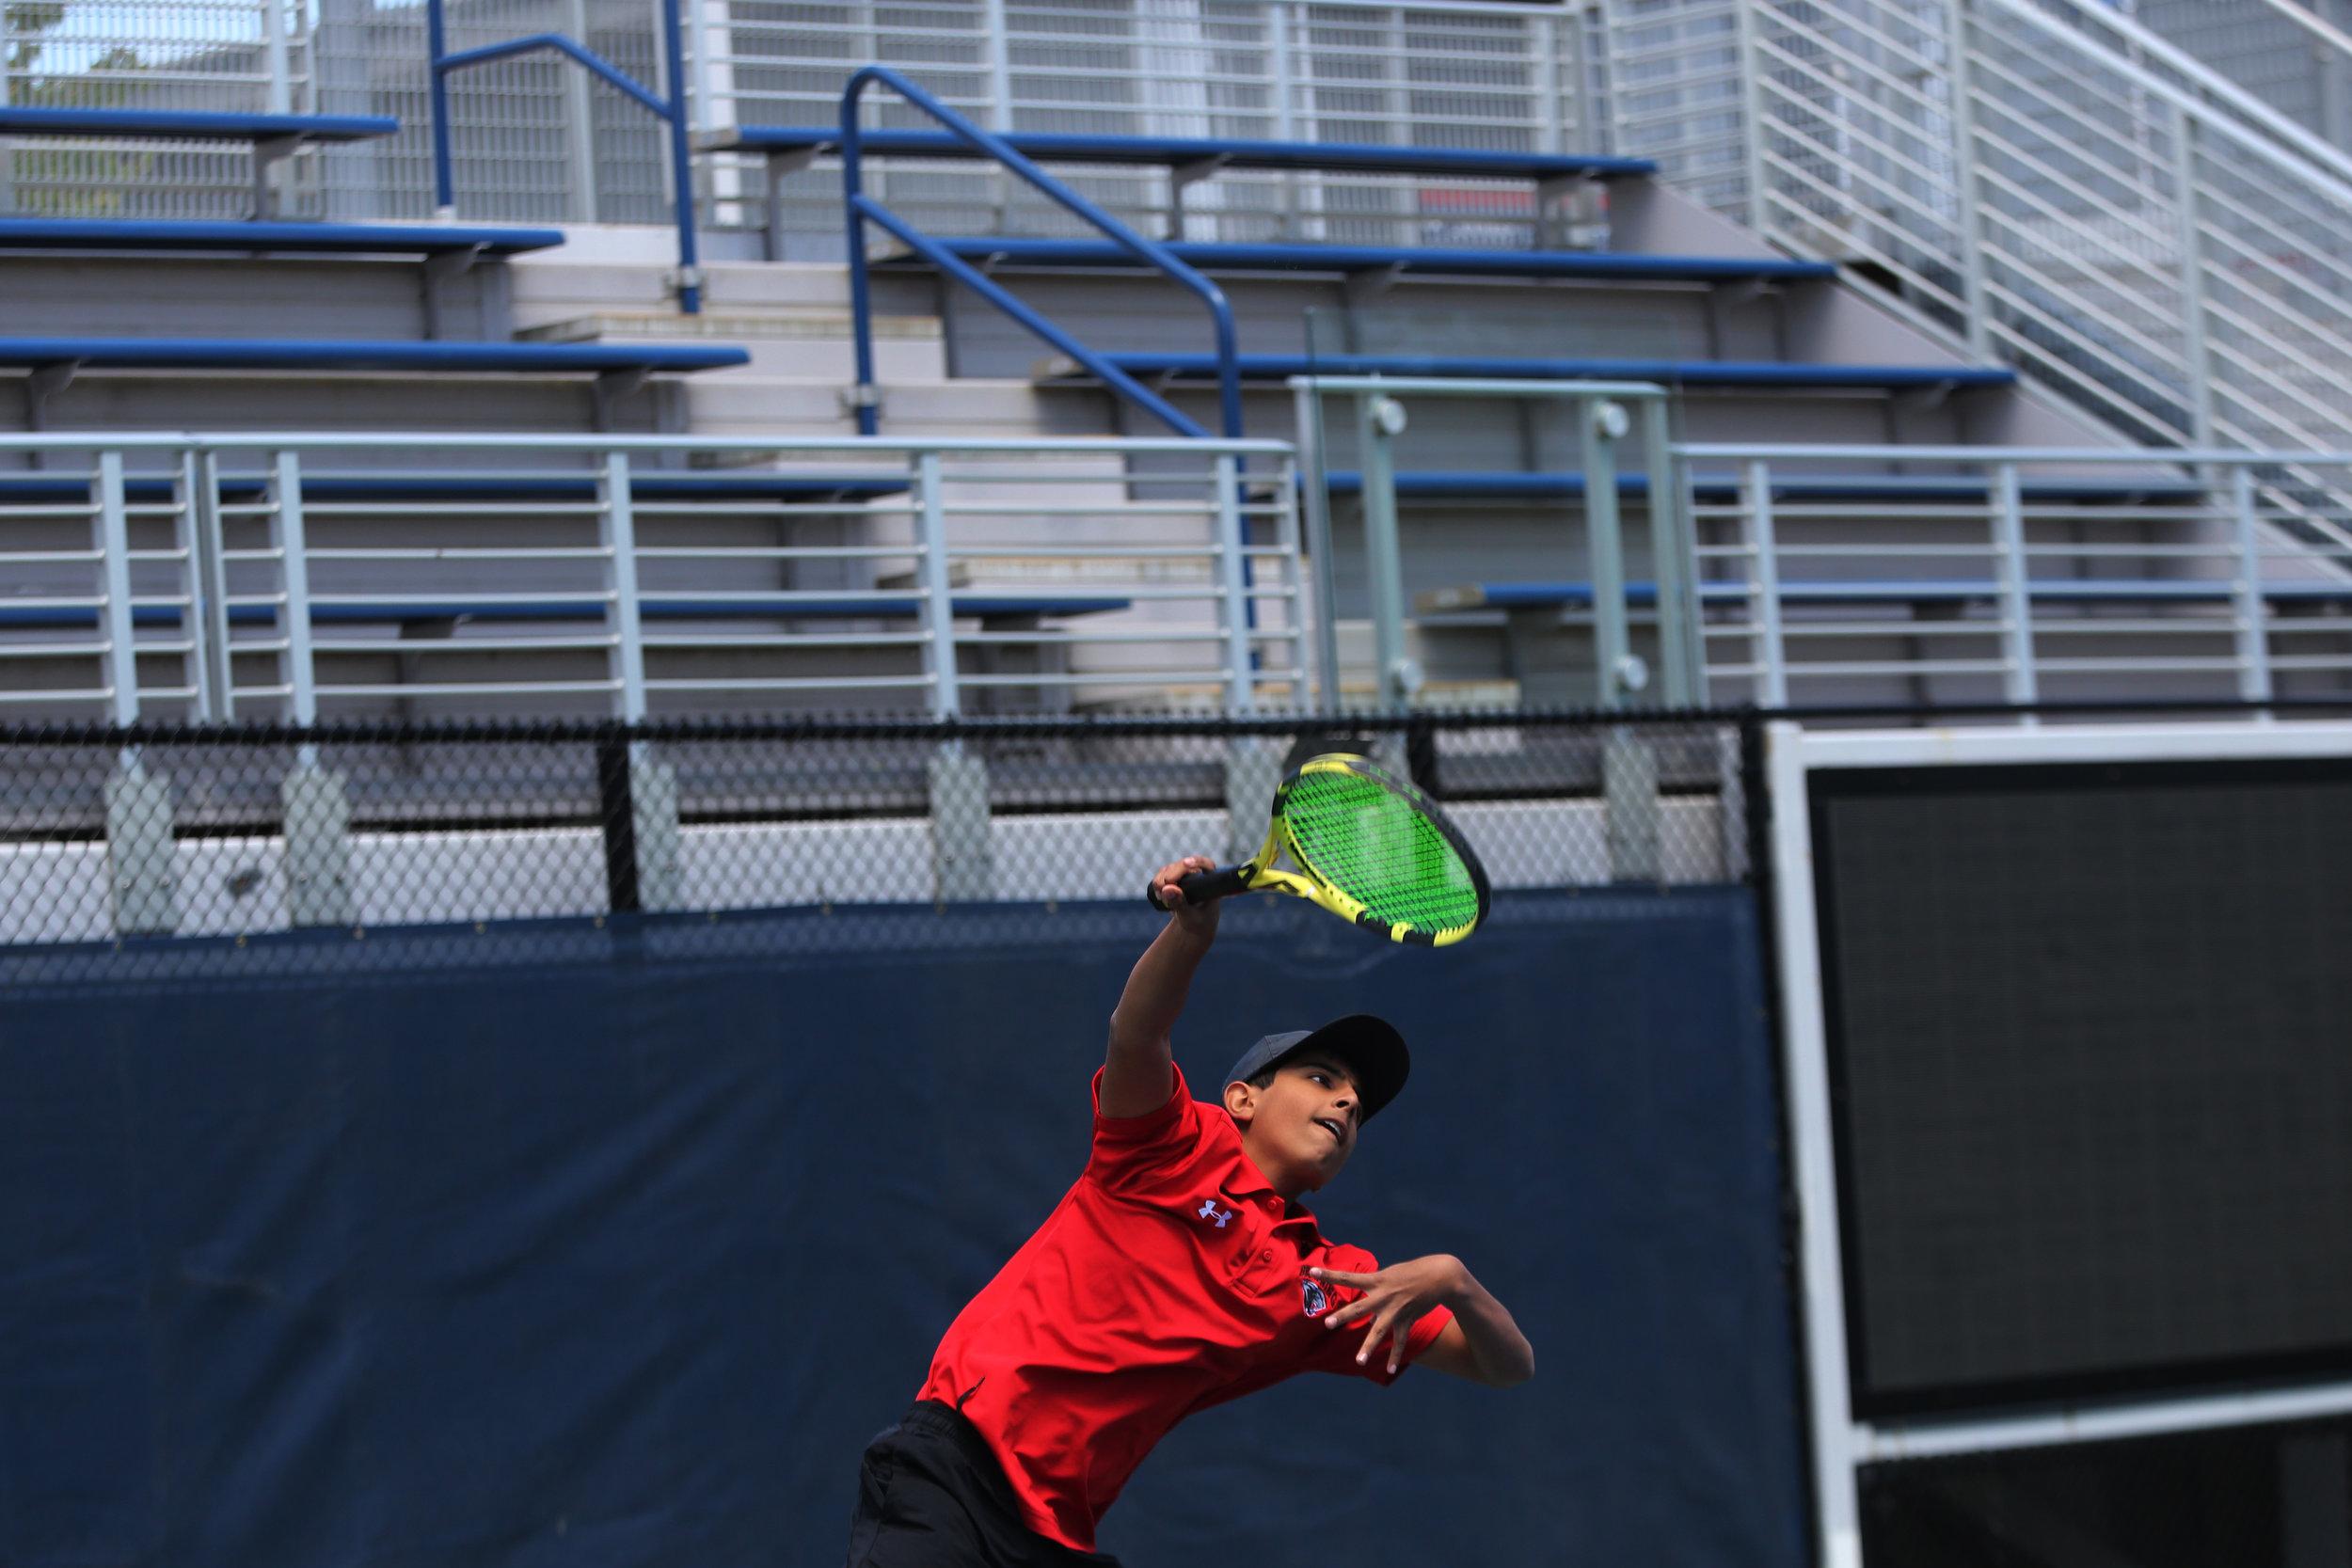 NYCAL Tennis Championships 051519-Al Pereira (727).JPG